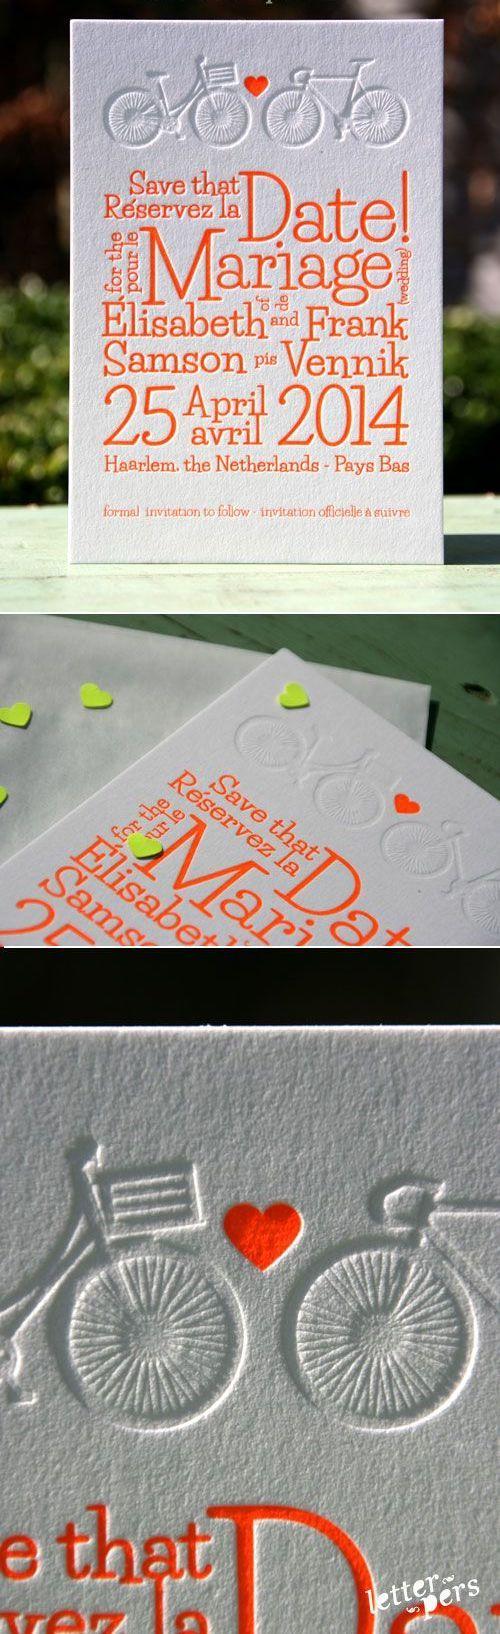 Invitación bilingüe en letterpress de letterpers.